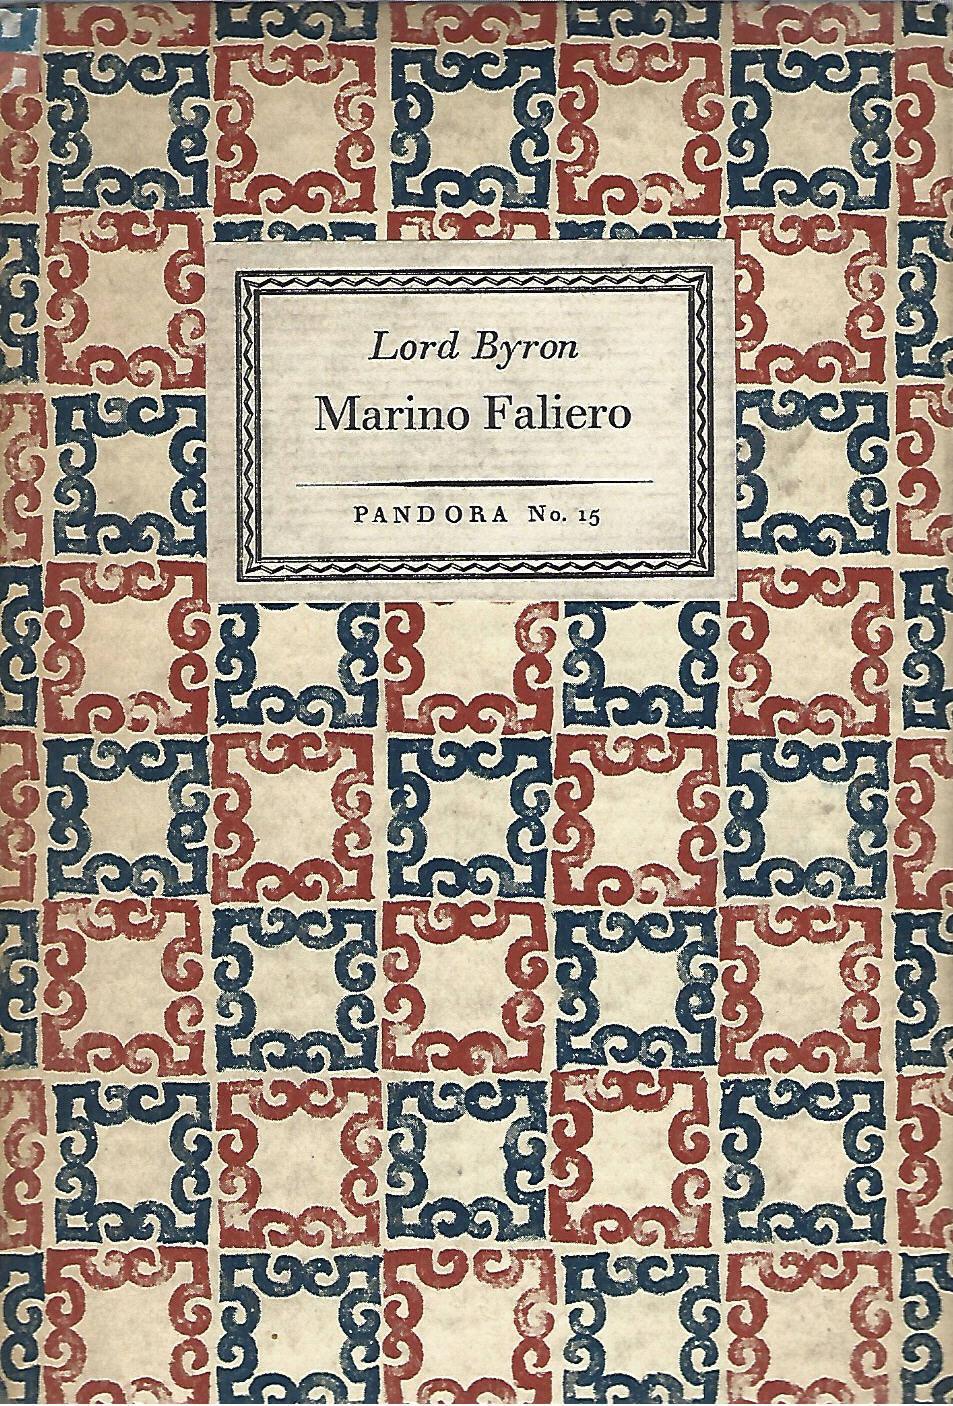 Marino Faliero. Doge of Venice. An historical: Lord Byron: